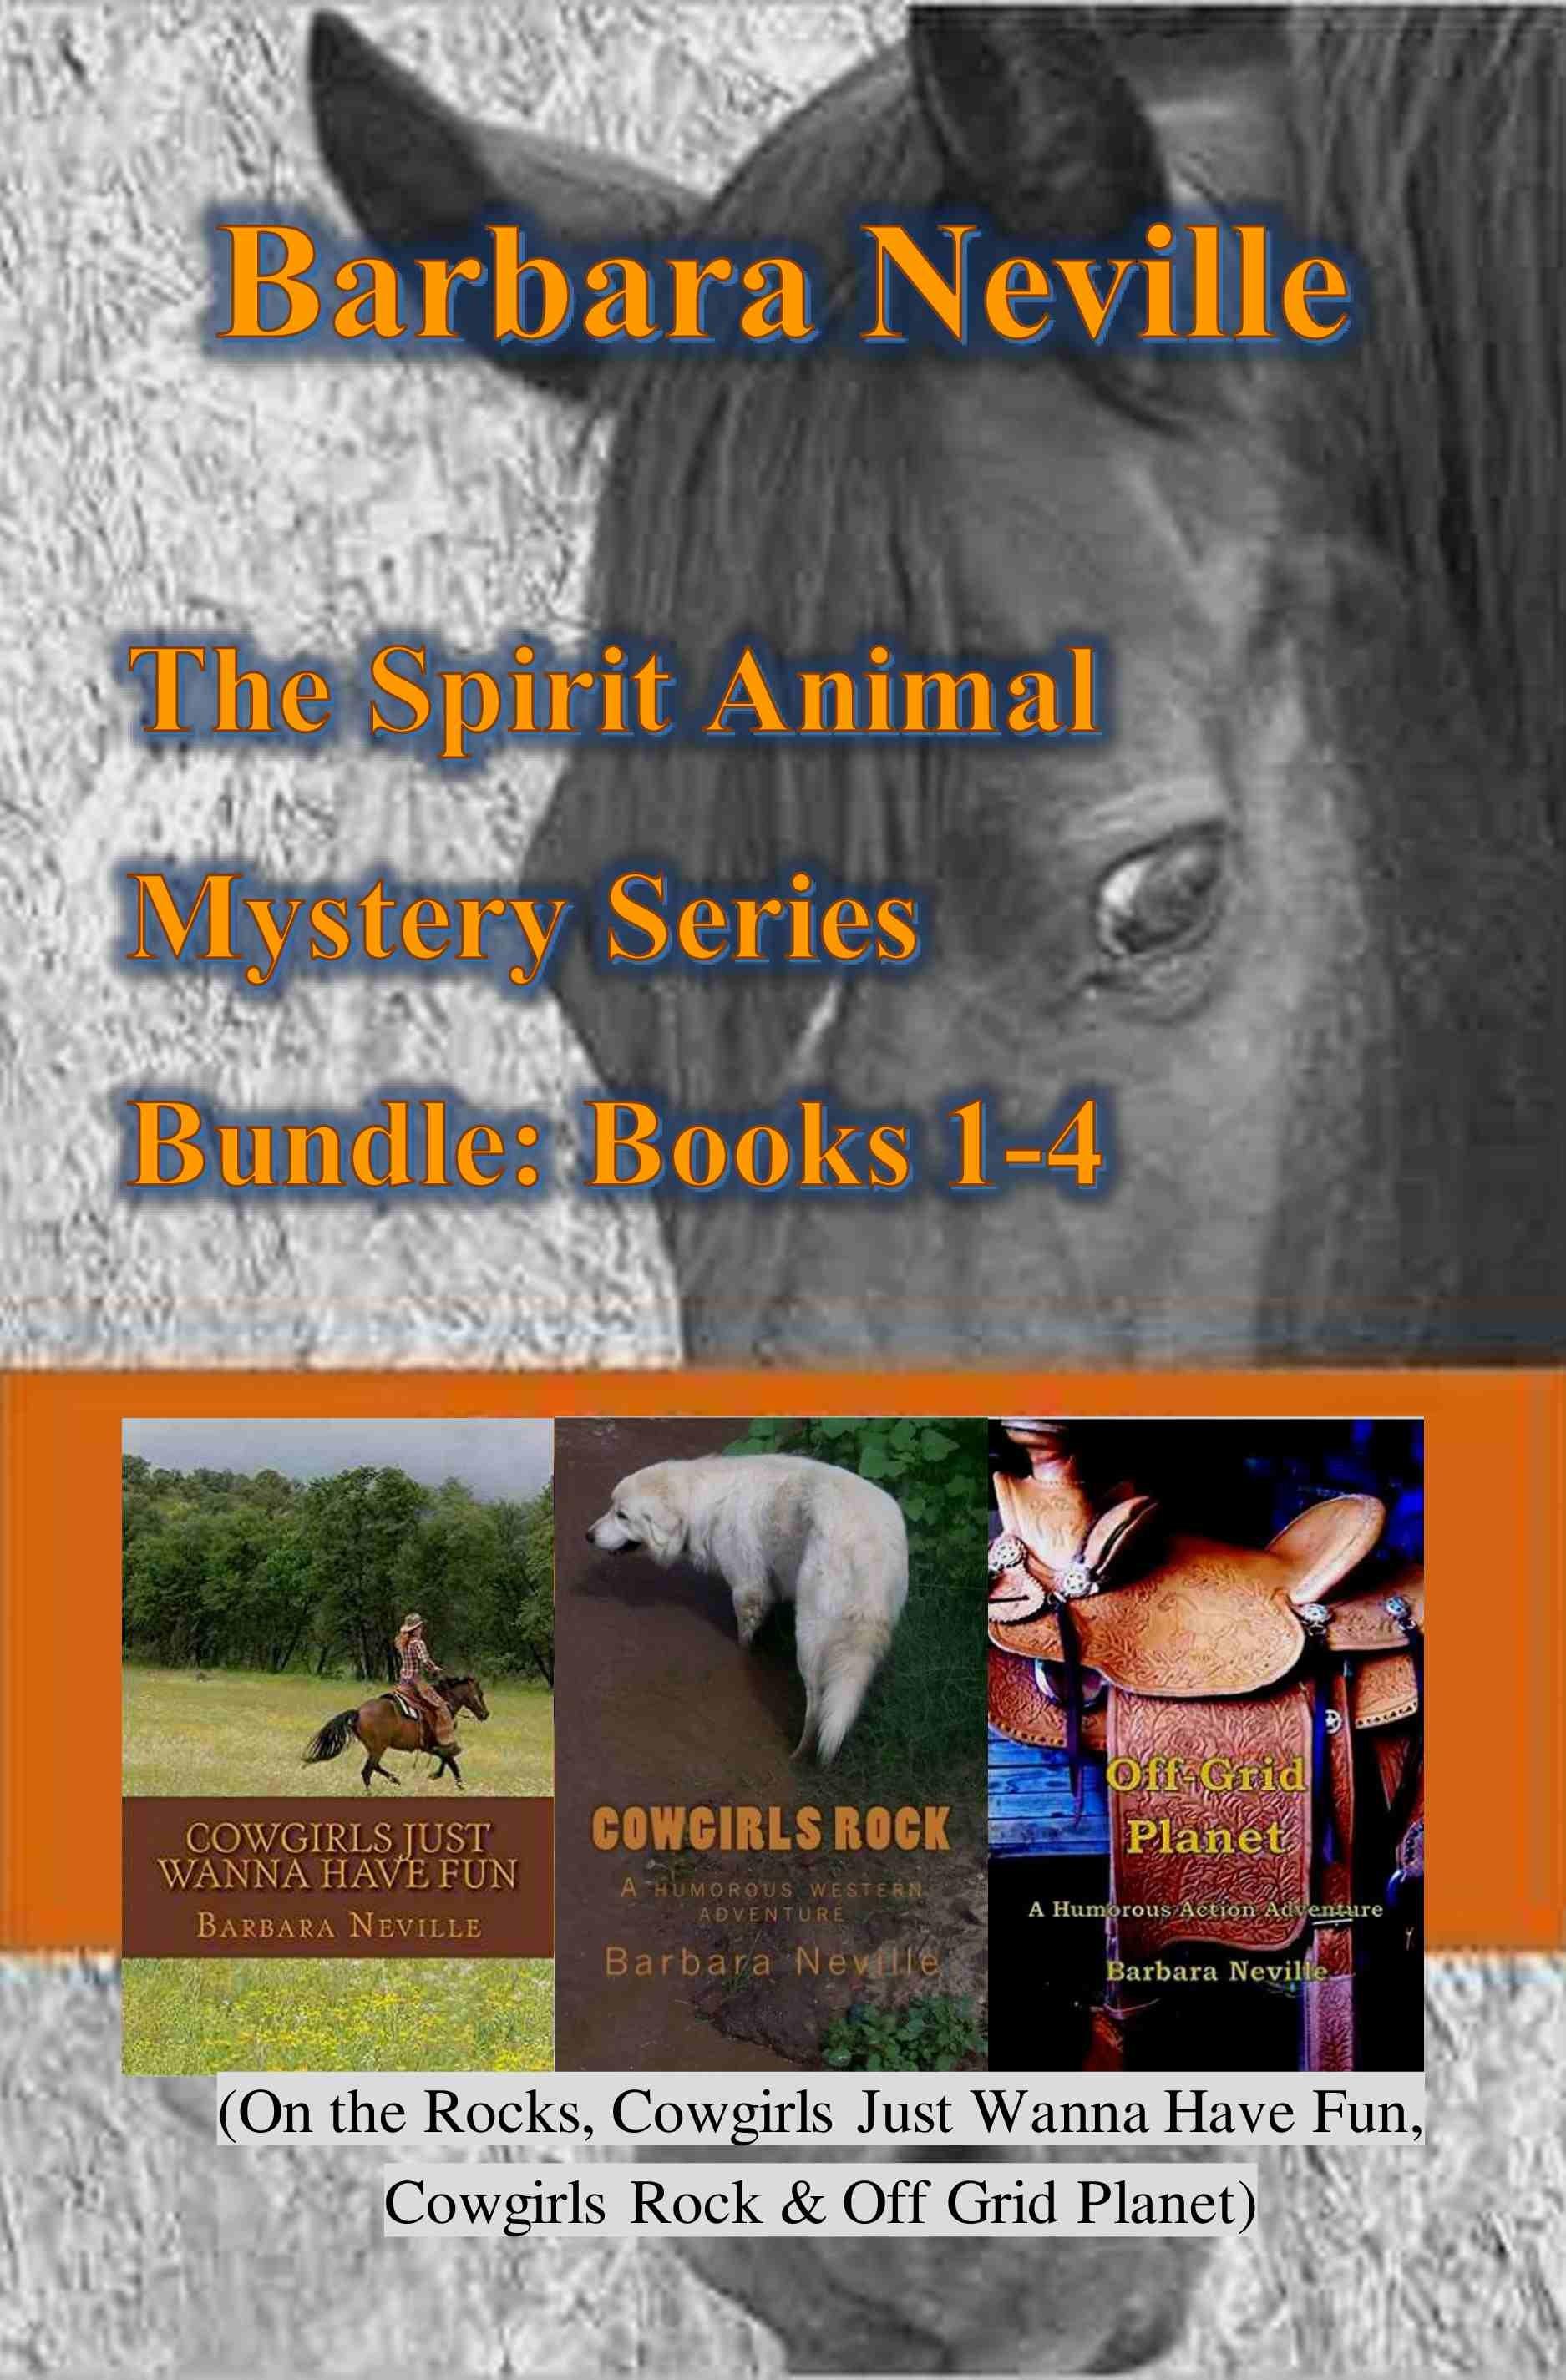 The Spirit Animal Mystery Series Bundle: Books 1-4